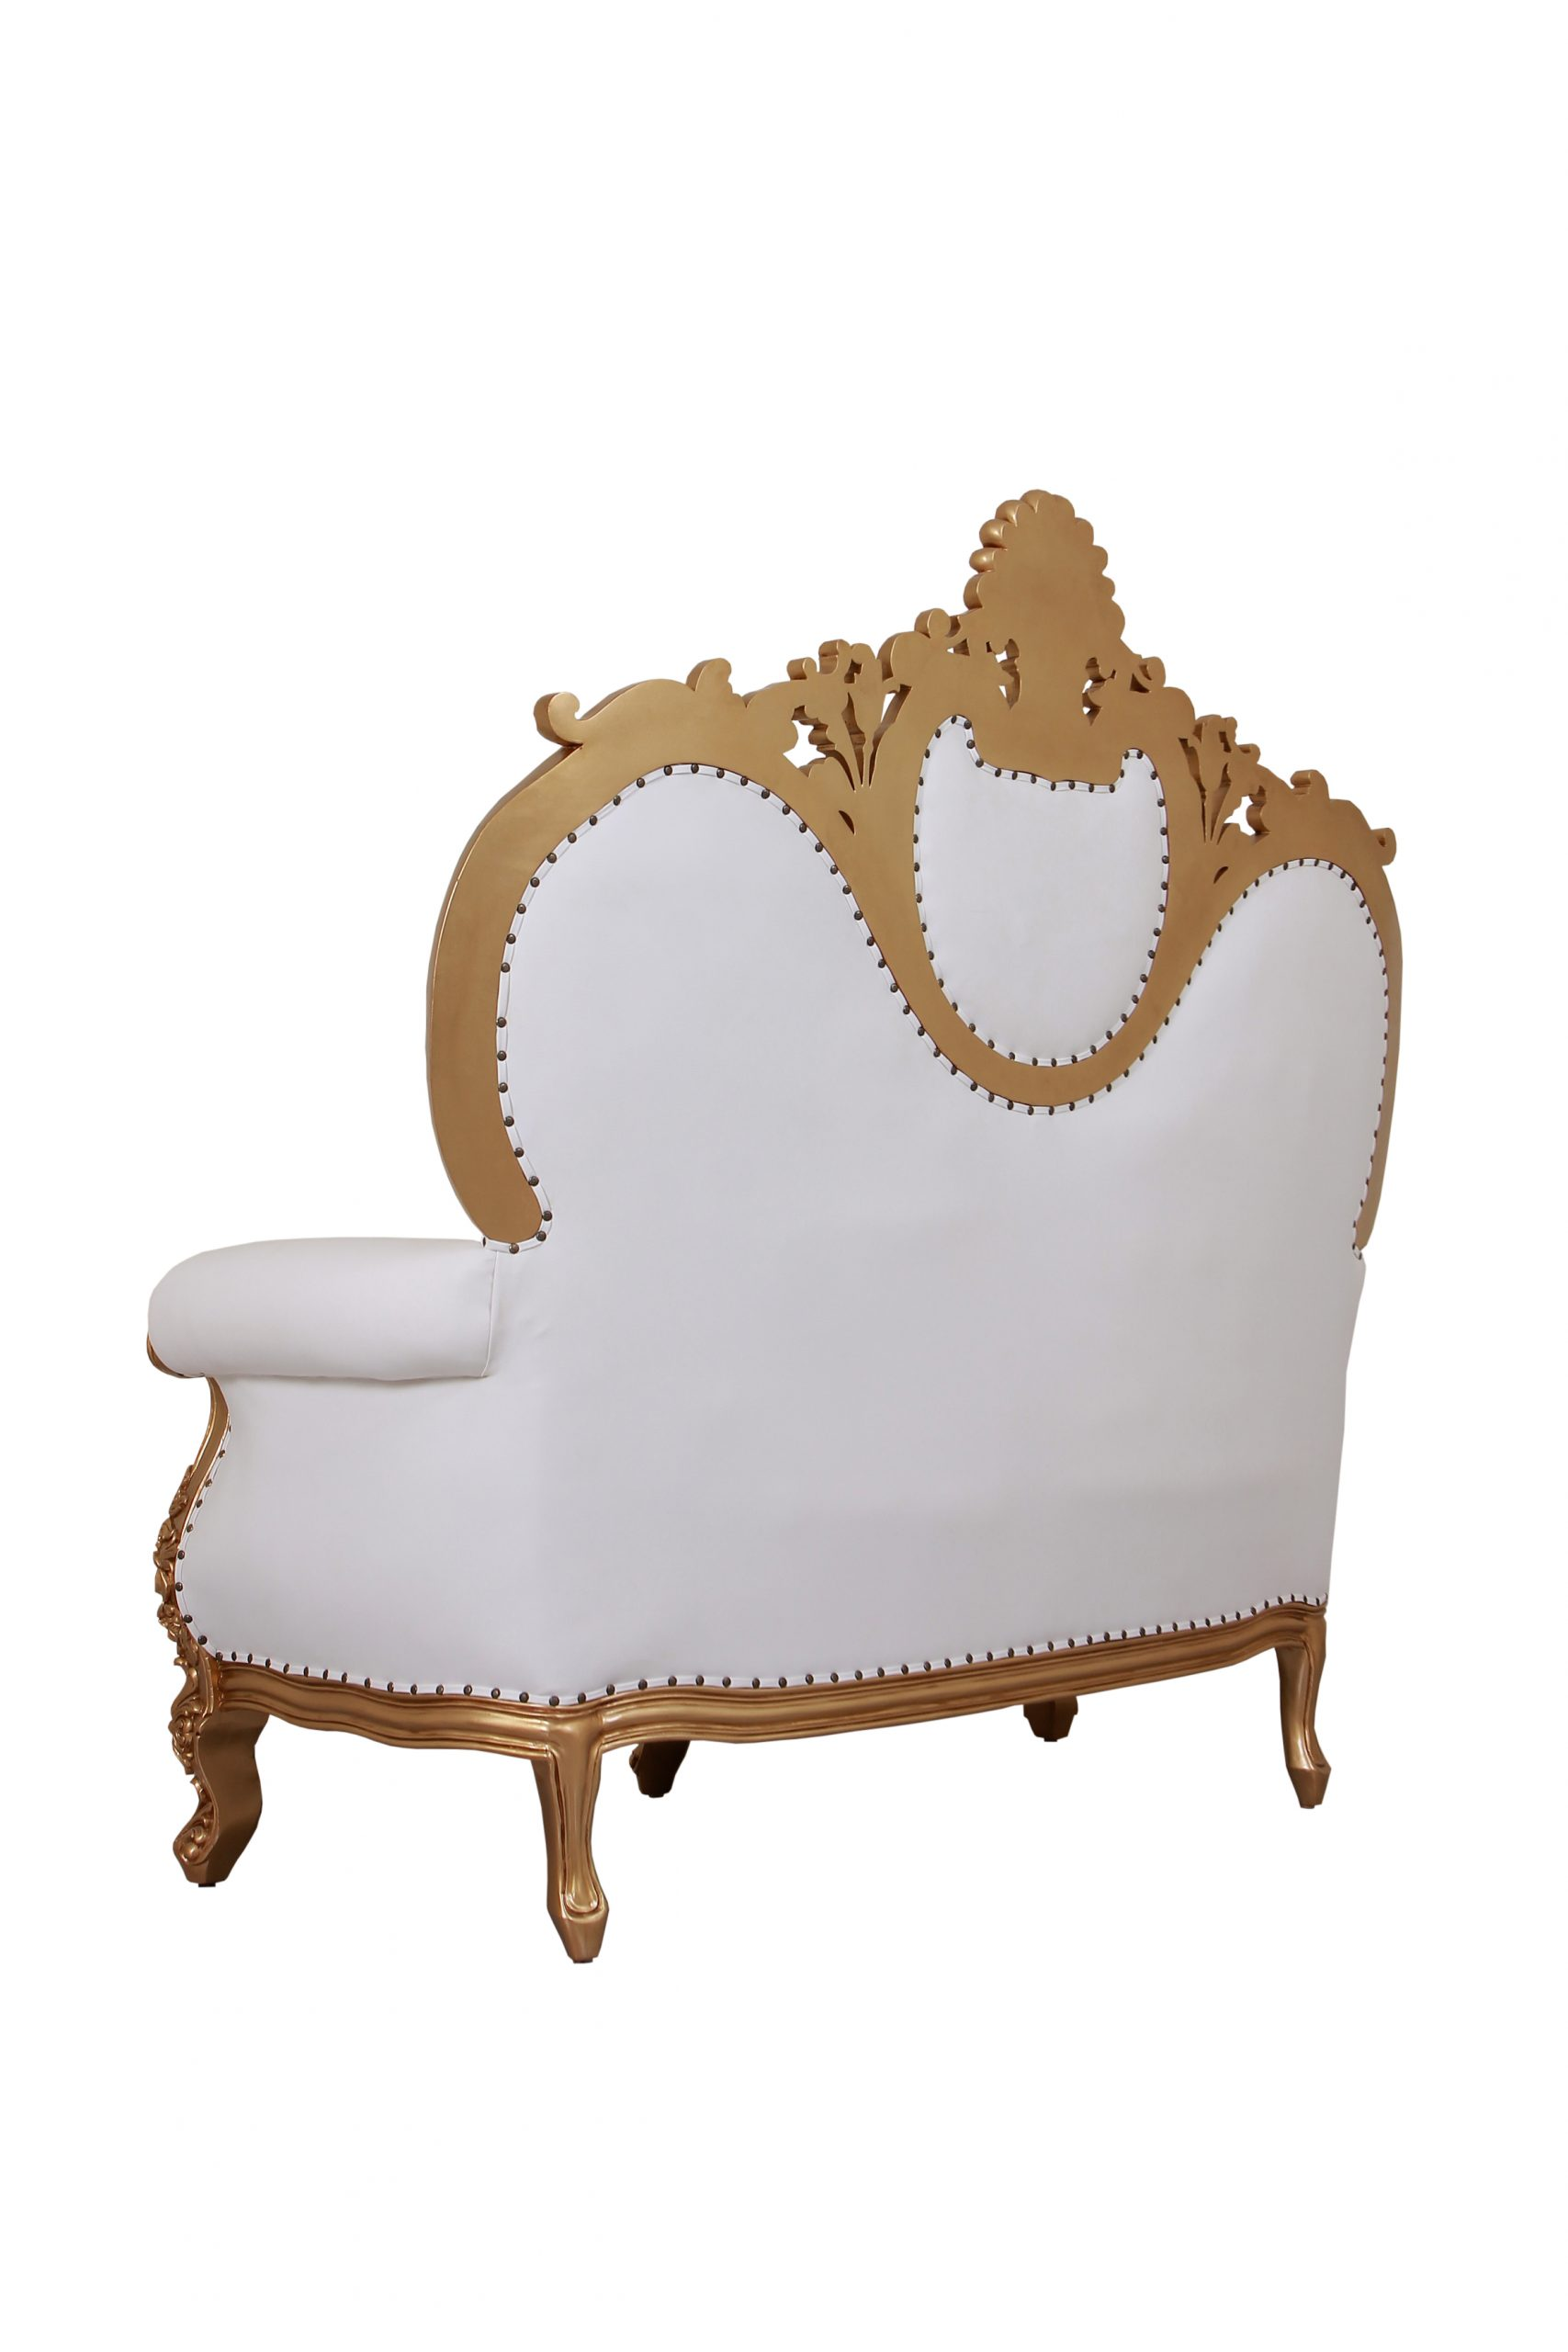 Full Size of Barock Sofa King Chair Luxus Mit Strasssteinen Jb Lashes Wildleder Garnitur Rotes Franz Fertig 3 Teilig Rattan Garten Led L Form Federkern Konfigurator Sofa Barock Sofa